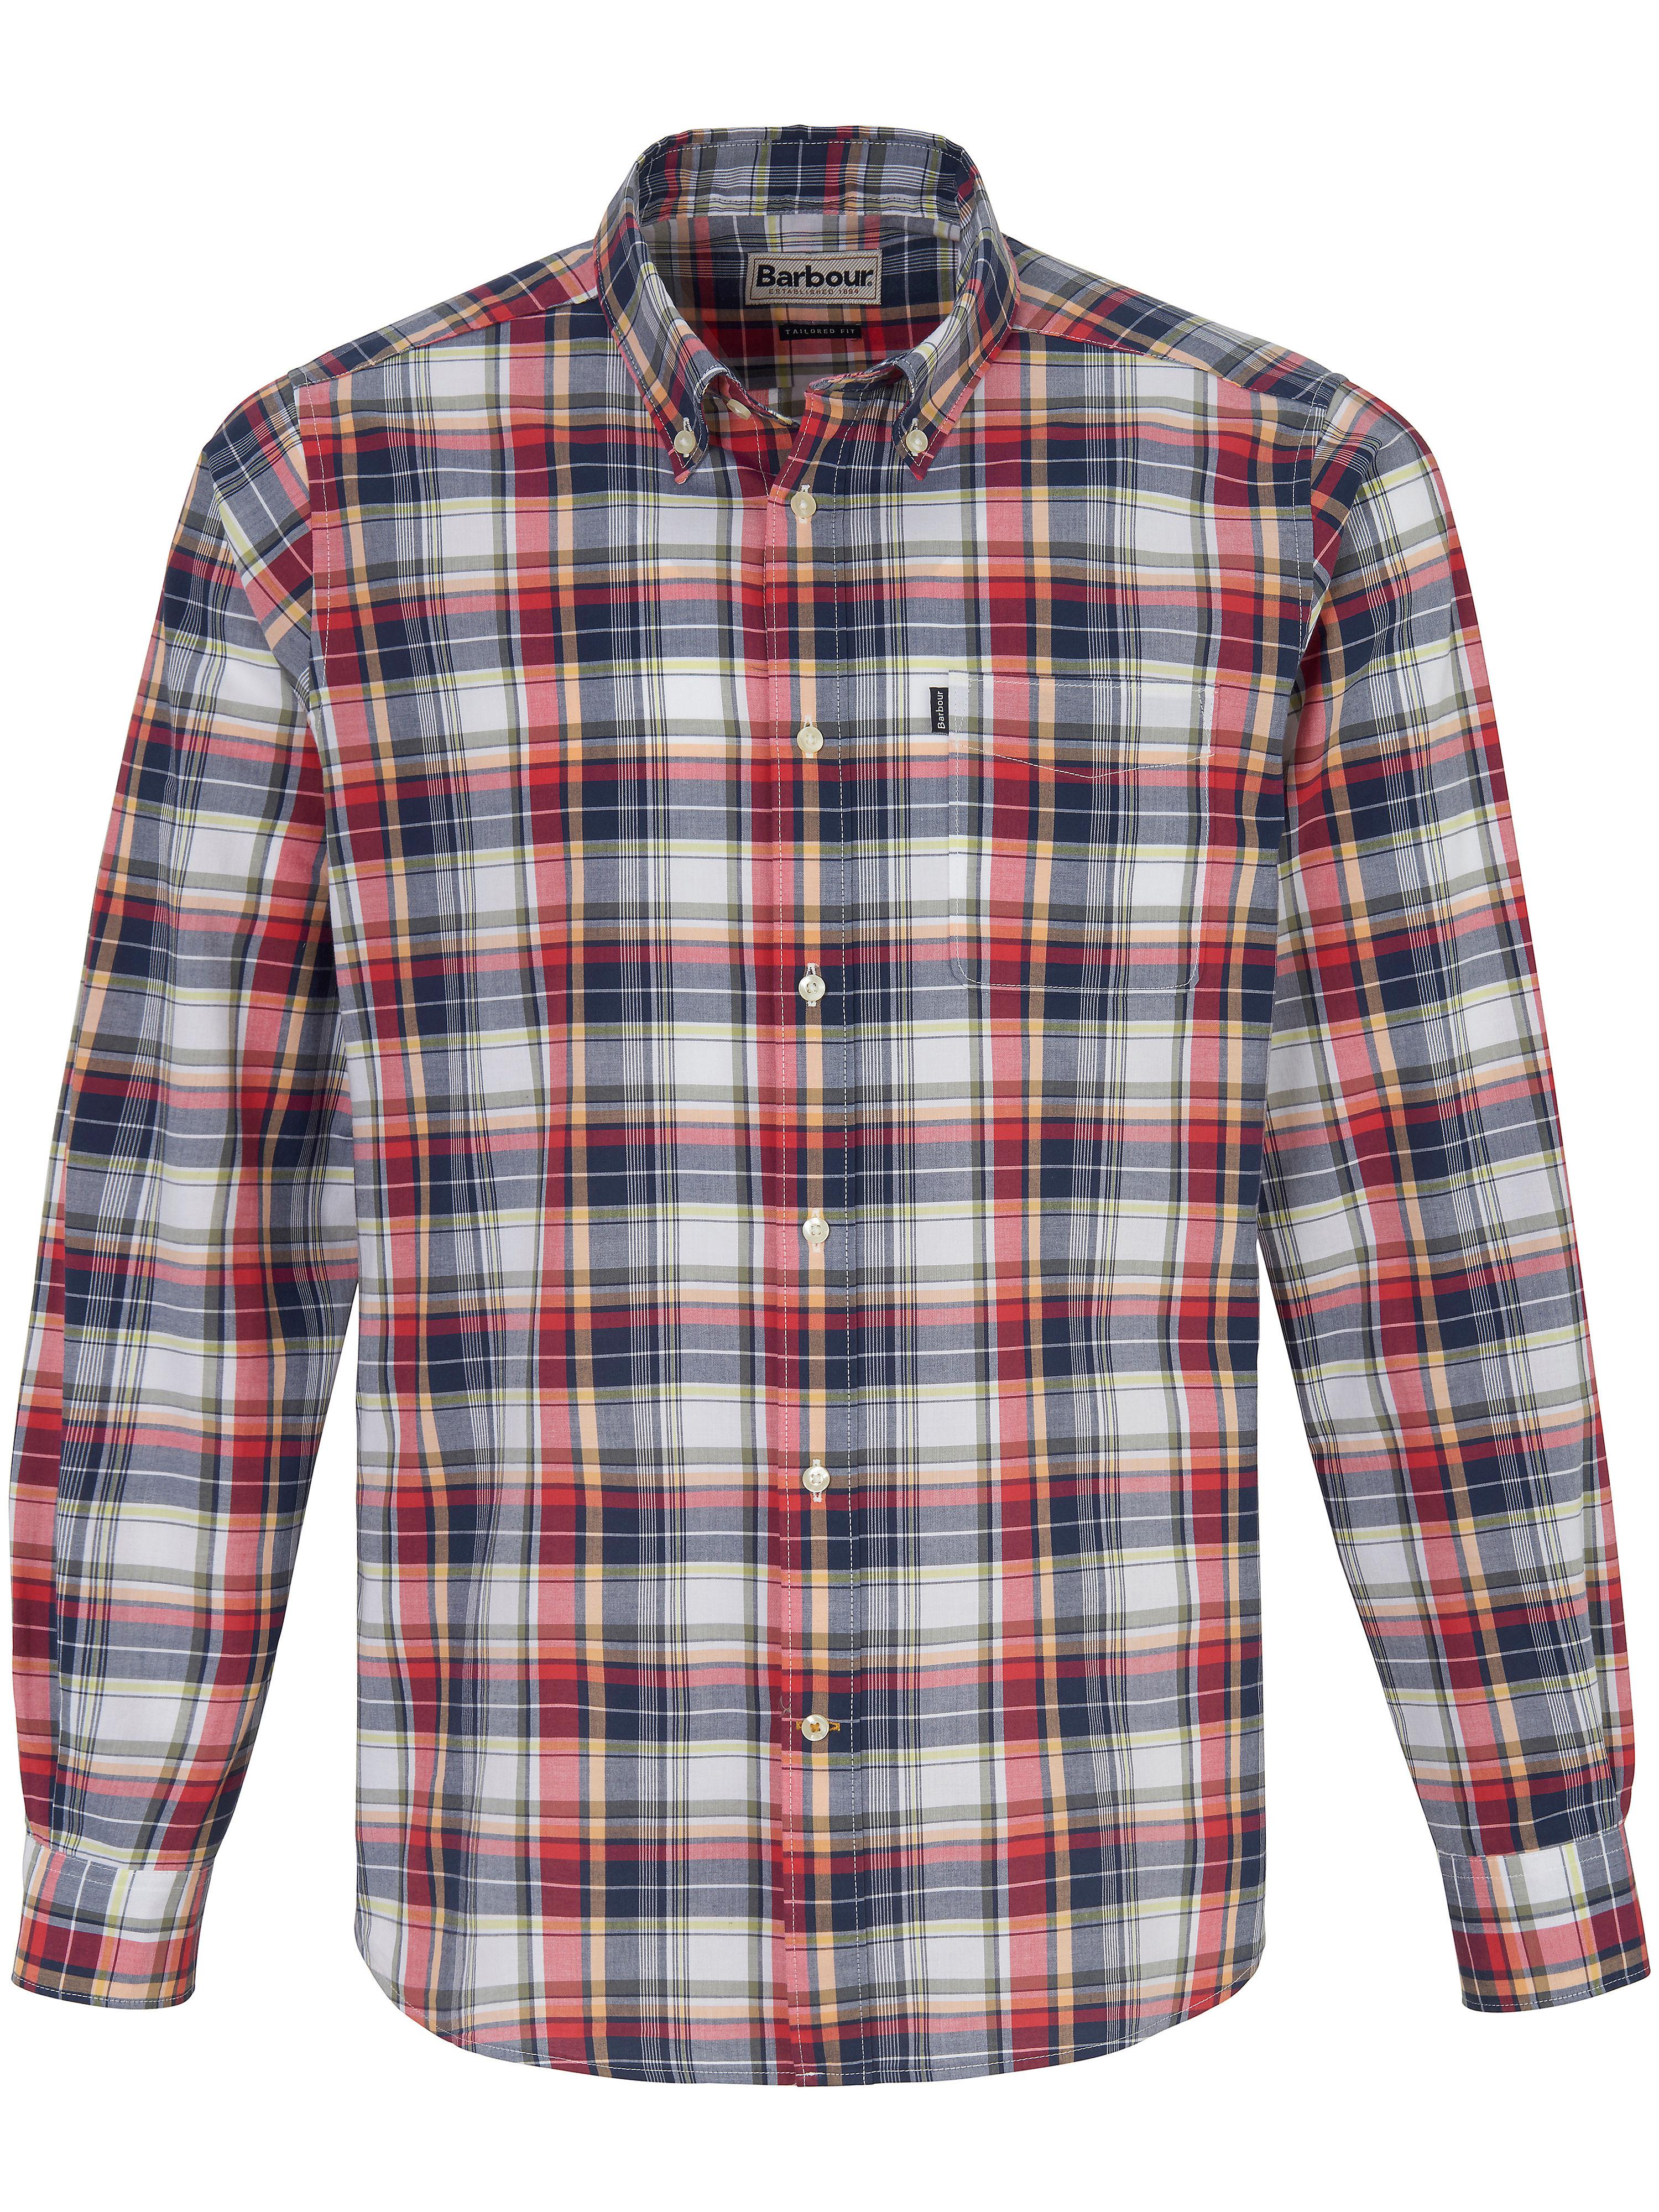 La chemise 100% coton  Barbour multicolore